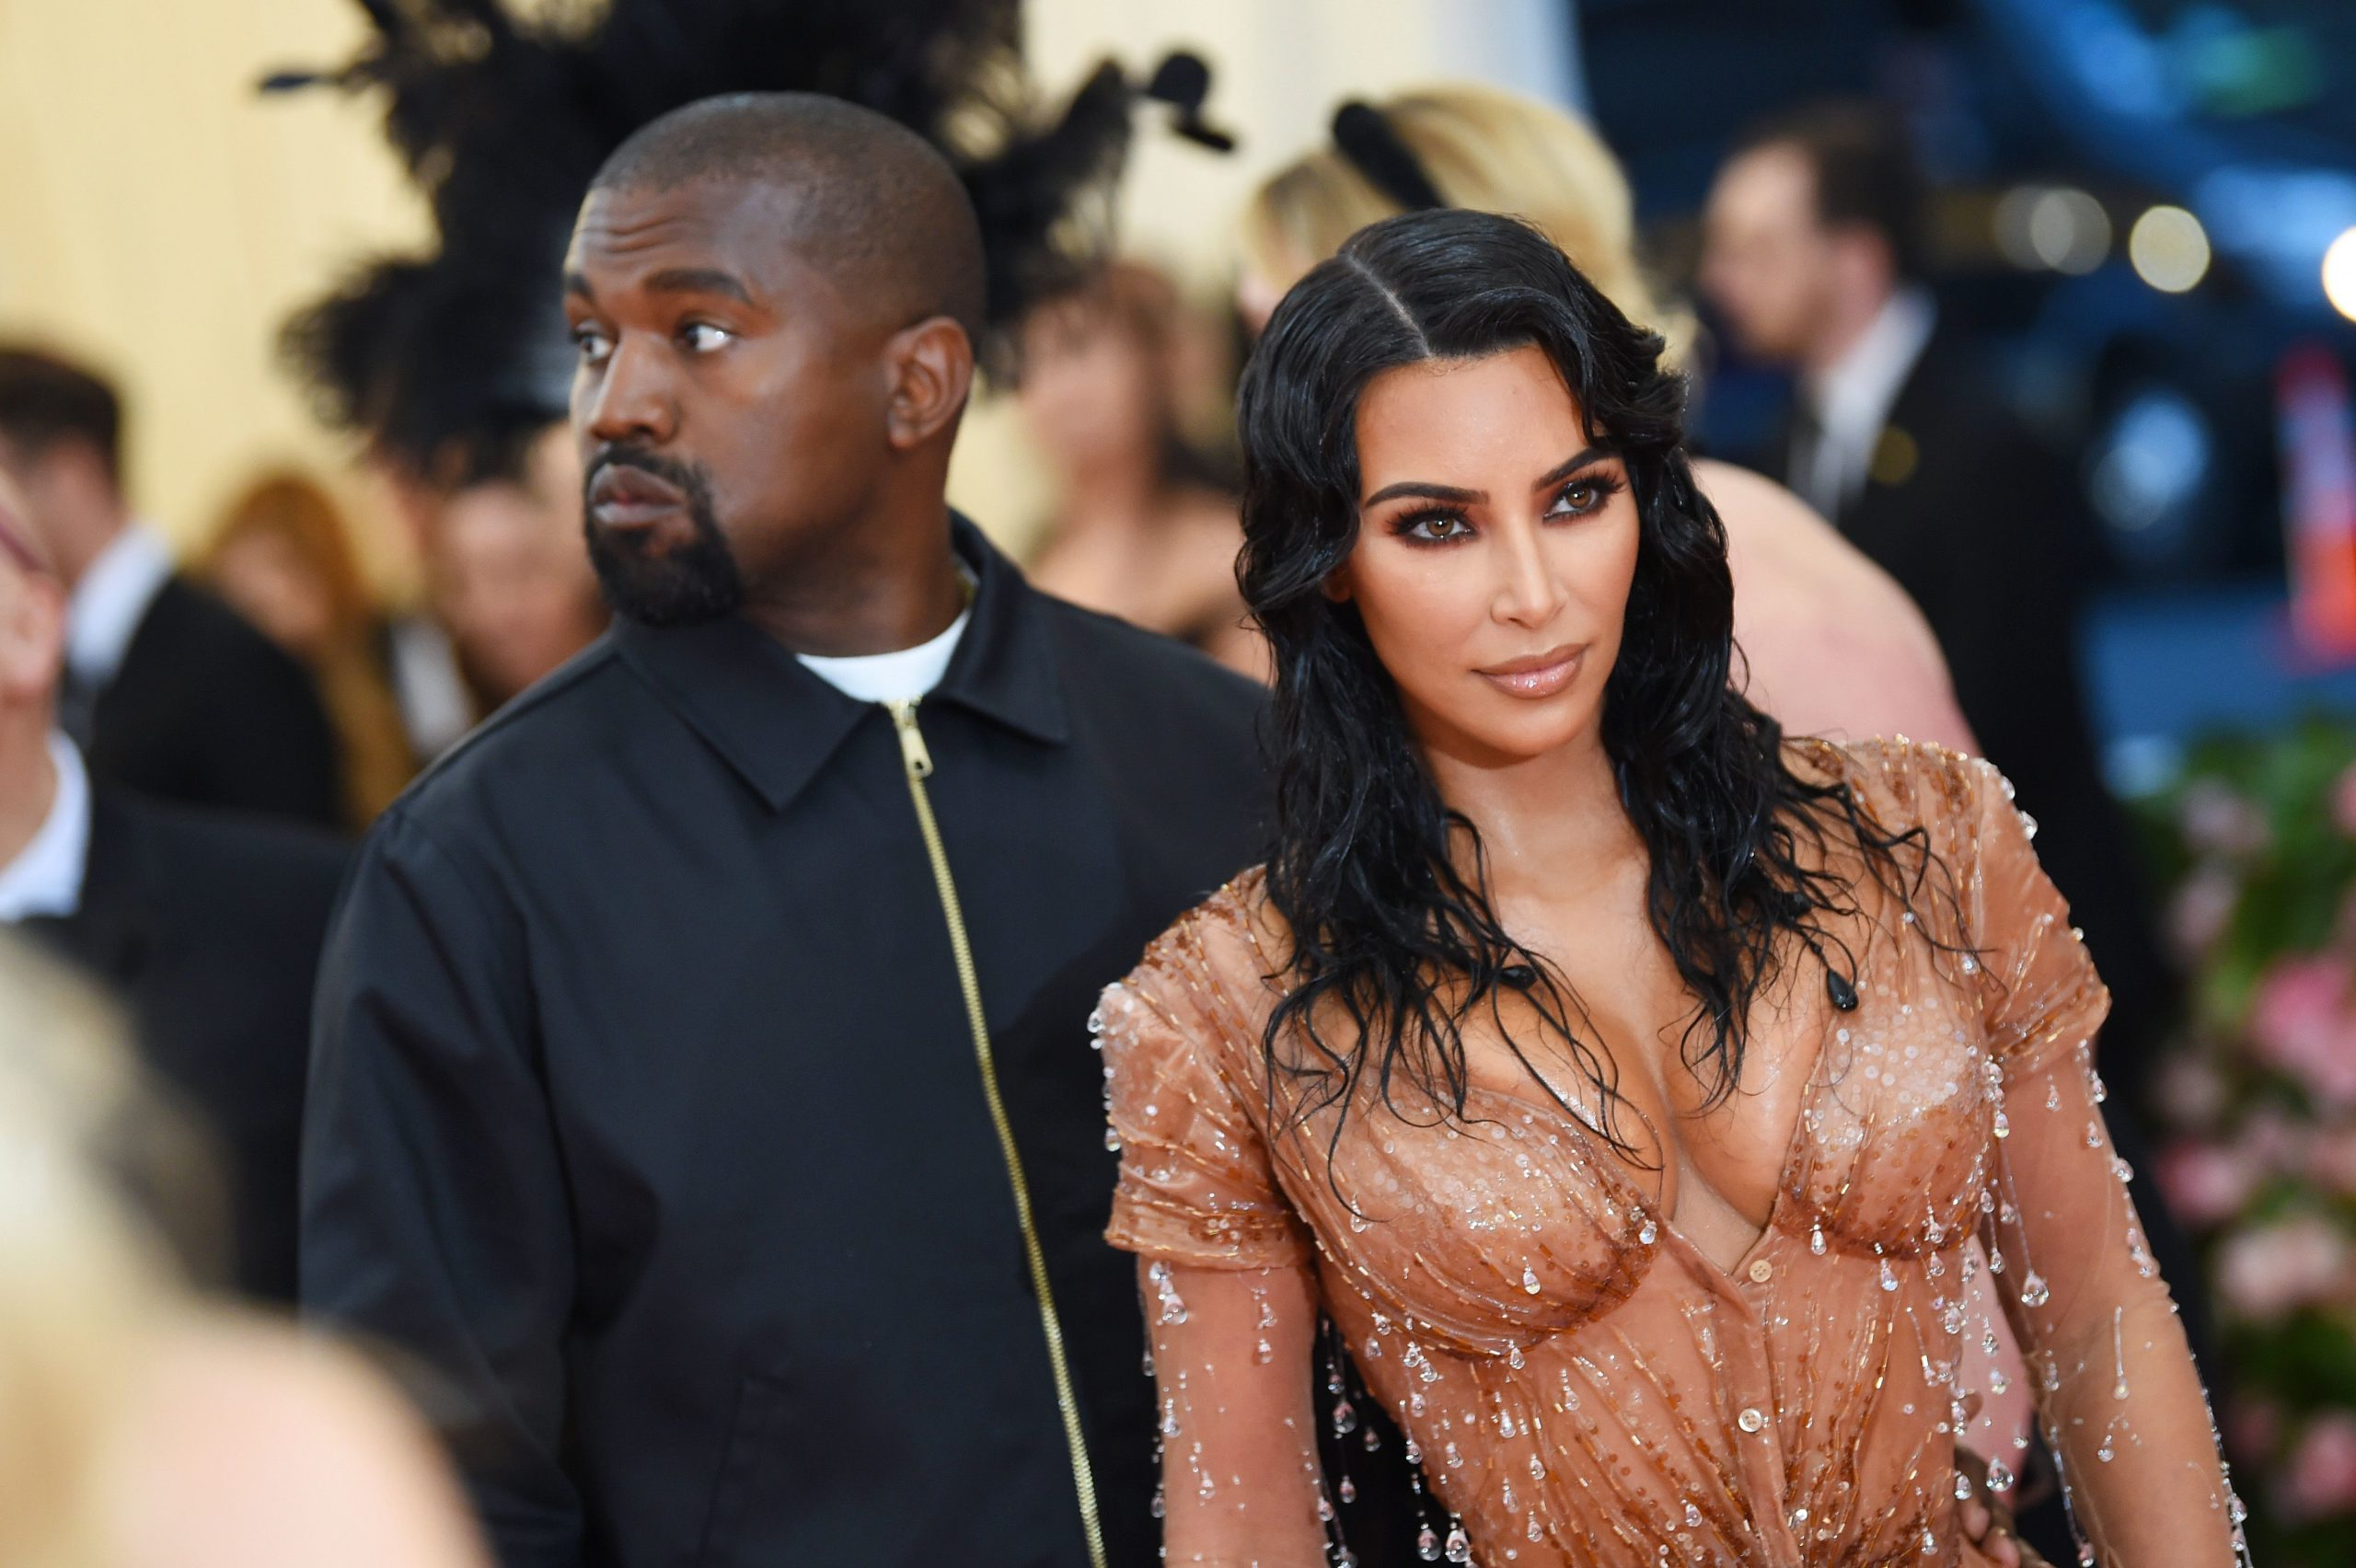 Kim Kardashian After Debra Messing SNL Criticism Approved Mom Kris Jenner Peace Message!